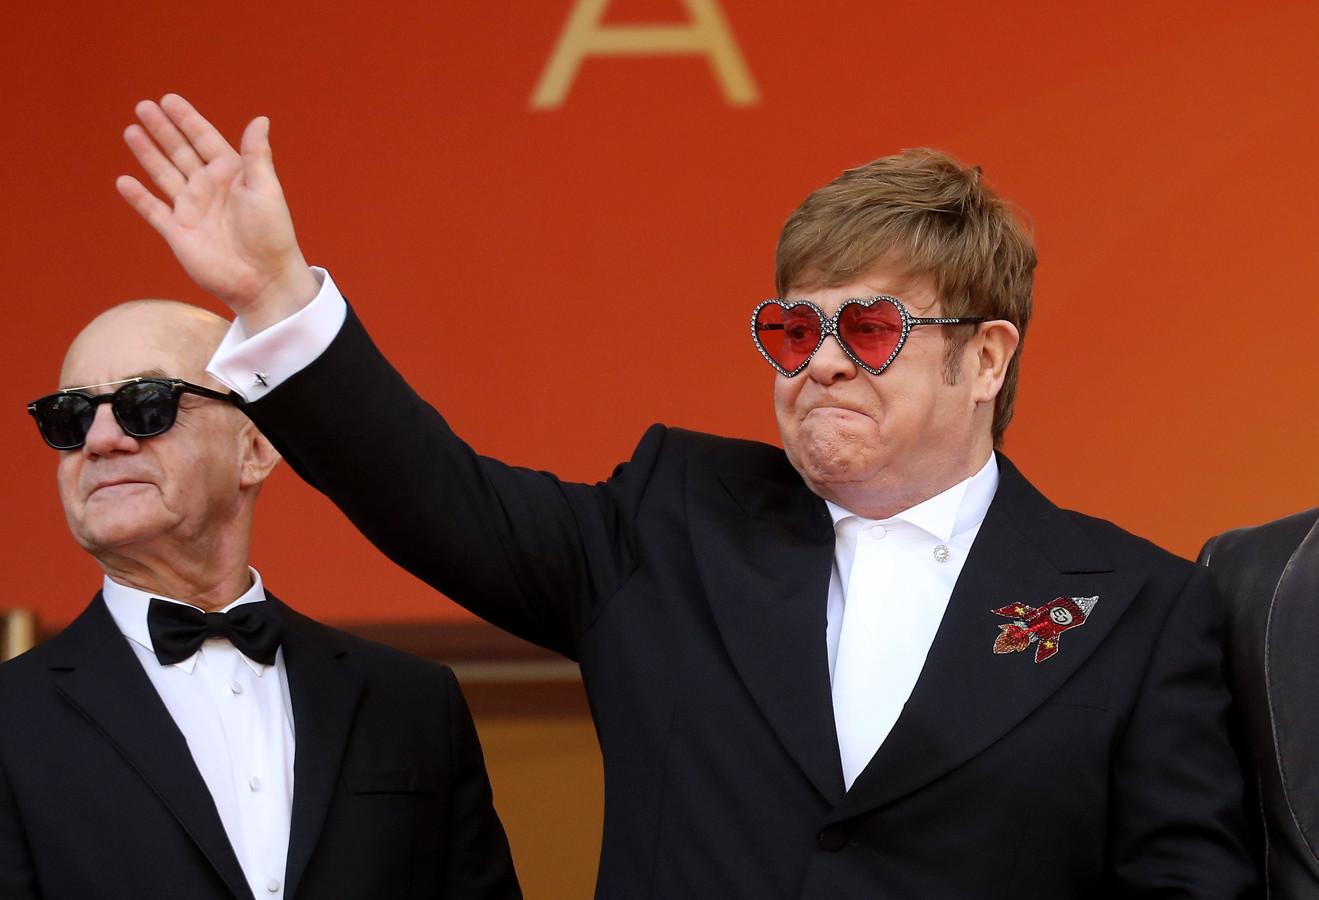 Bernie Taupin, Elton John